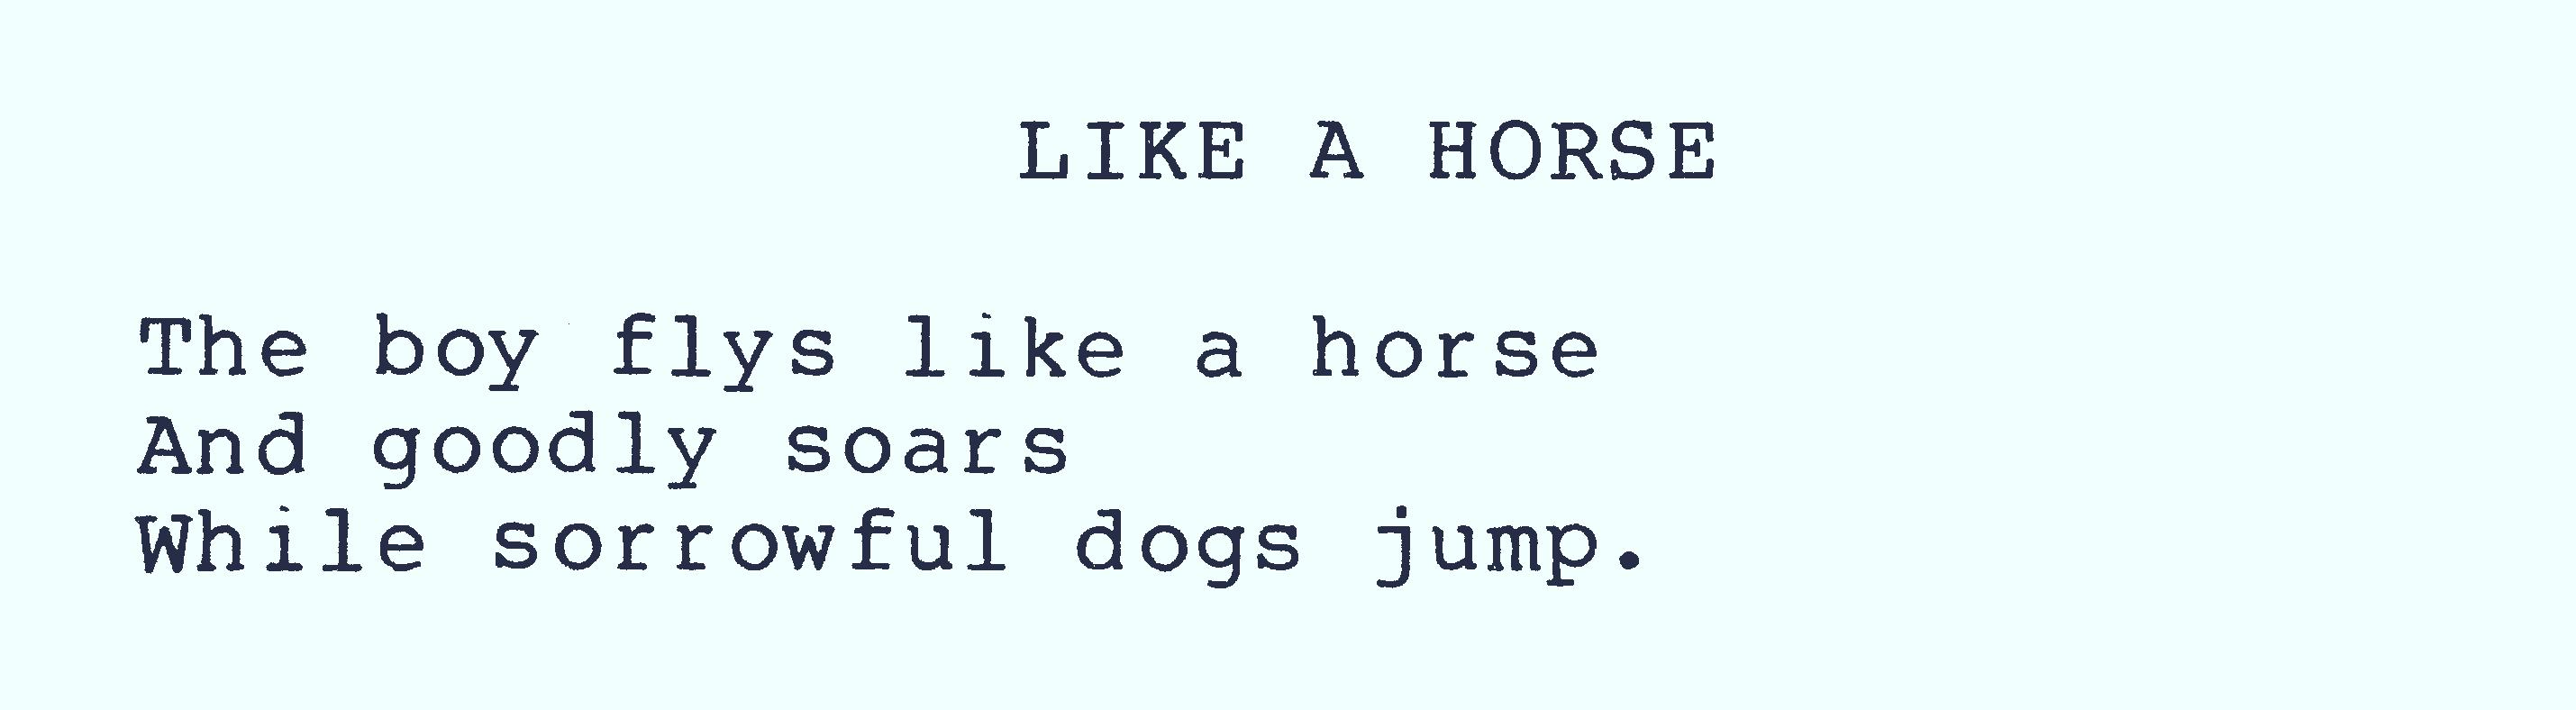 Fly like a horse